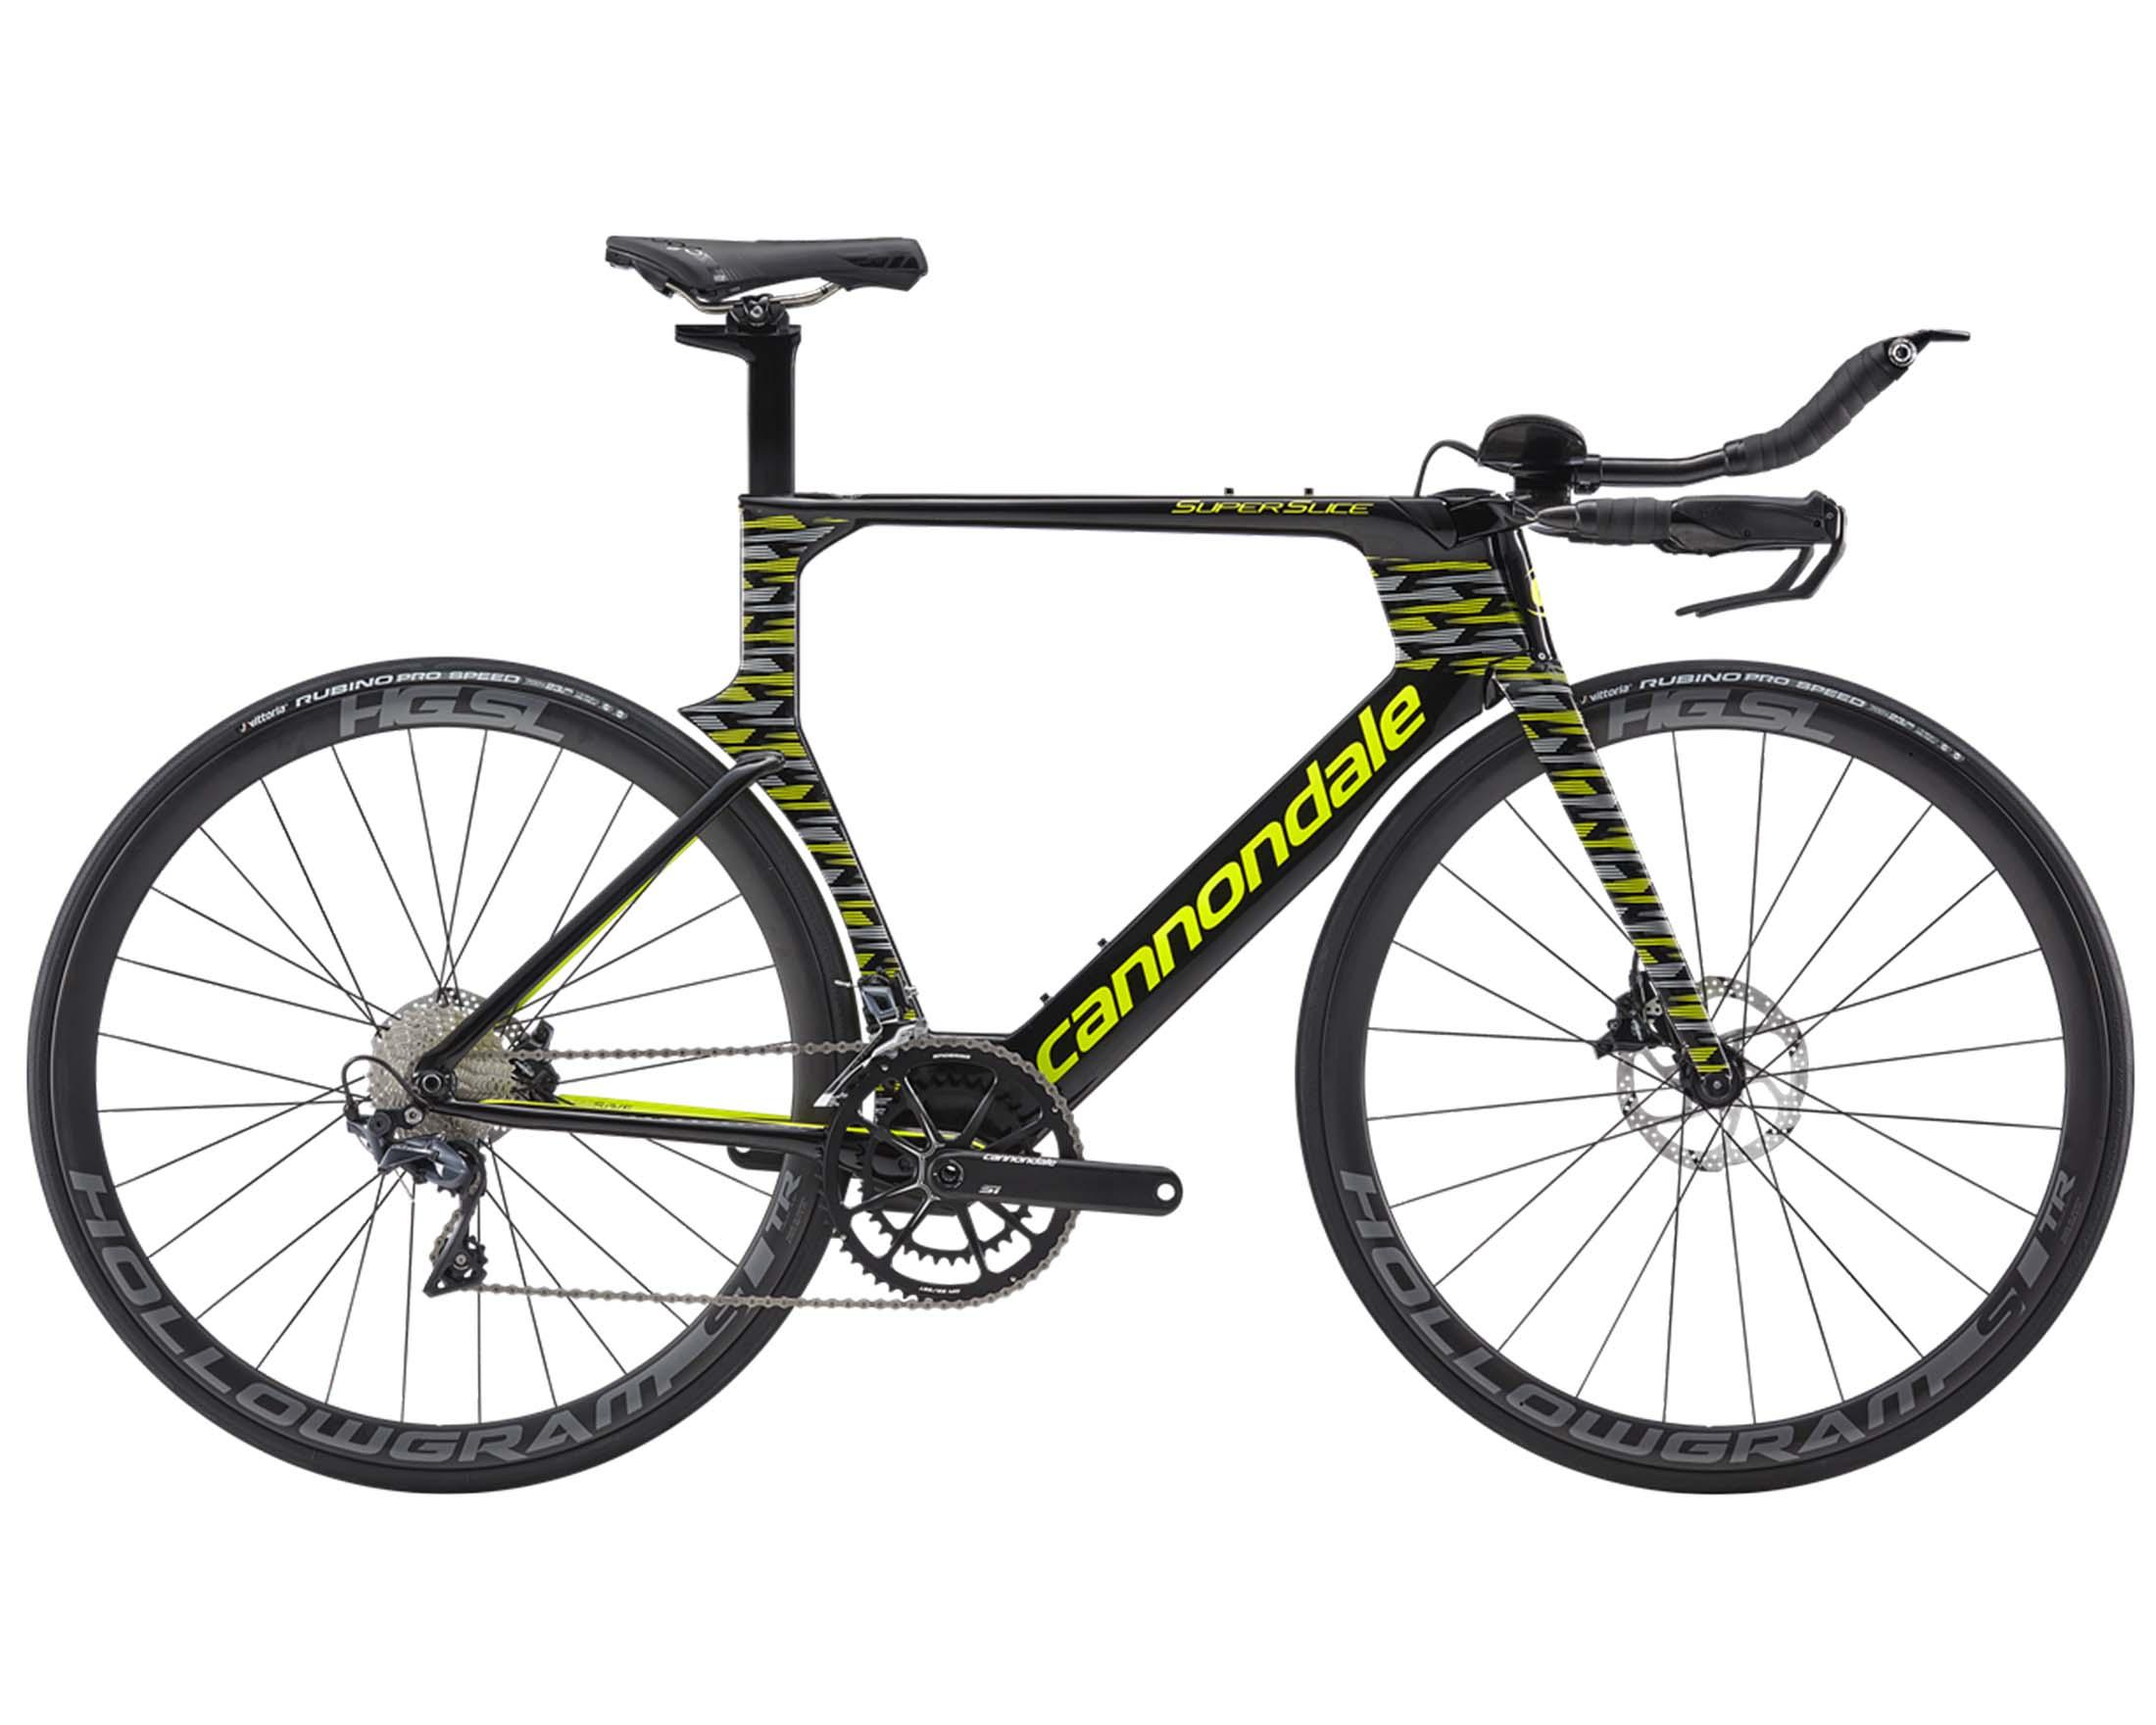 cannondale triathlon bike fahrrad f r profis. Black Bedroom Furniture Sets. Home Design Ideas